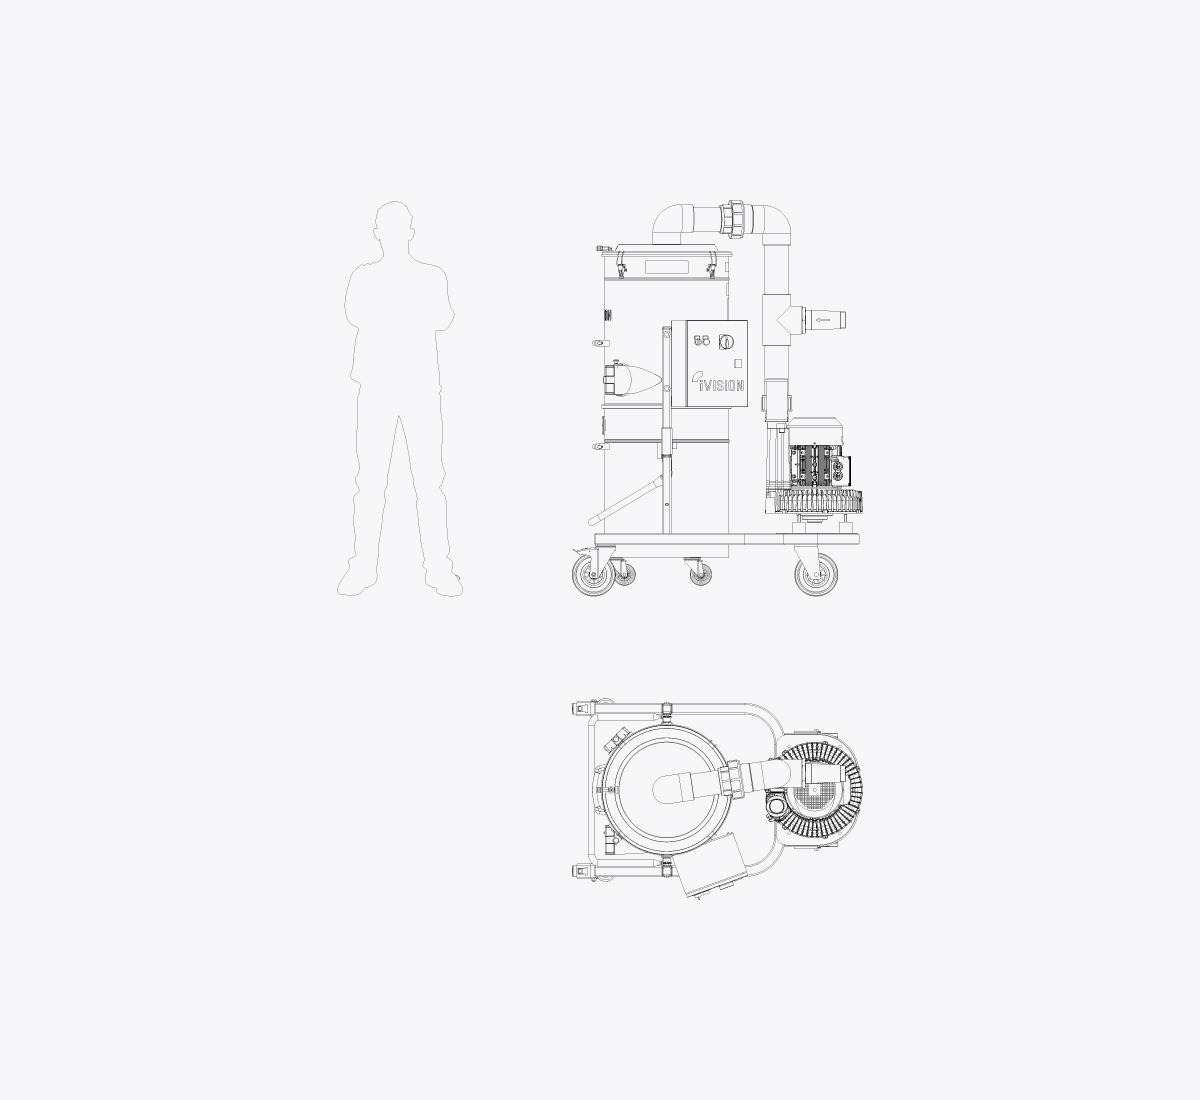 iv3-clean-line-industrial-vacuum-cleaners-ivision-vacuum-dt